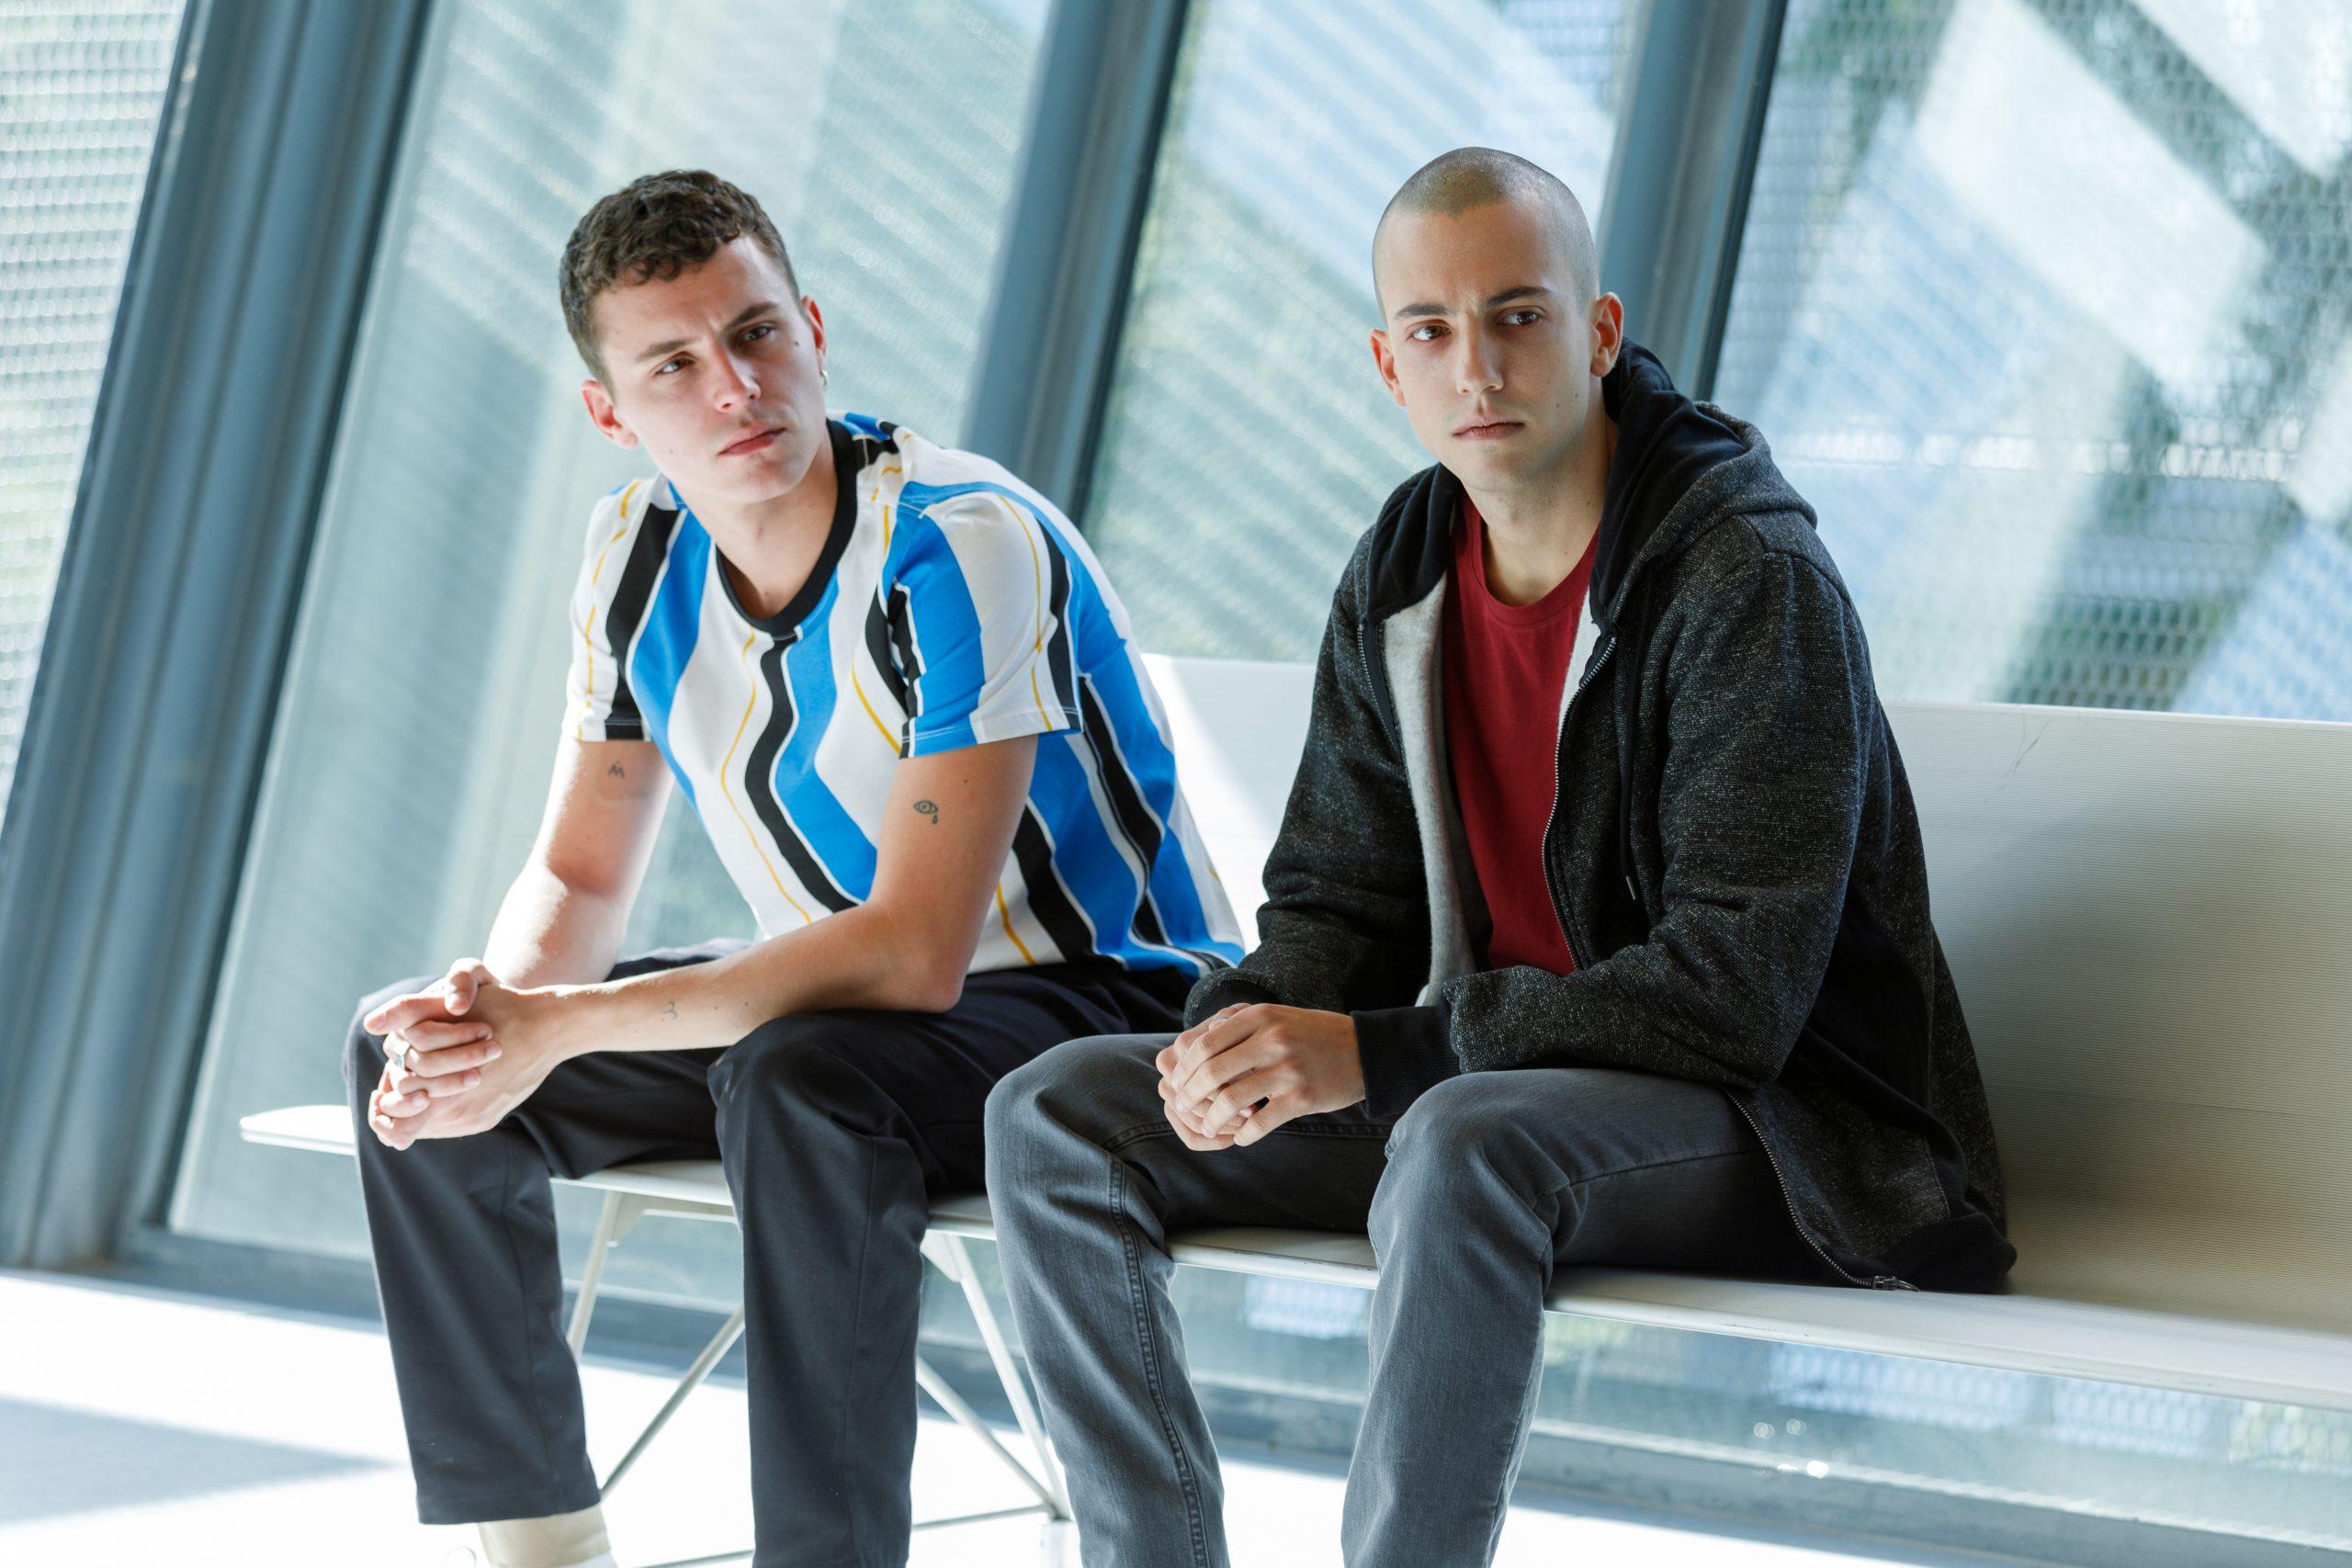 lite Öyküler: Omar, Ander ve Alexis